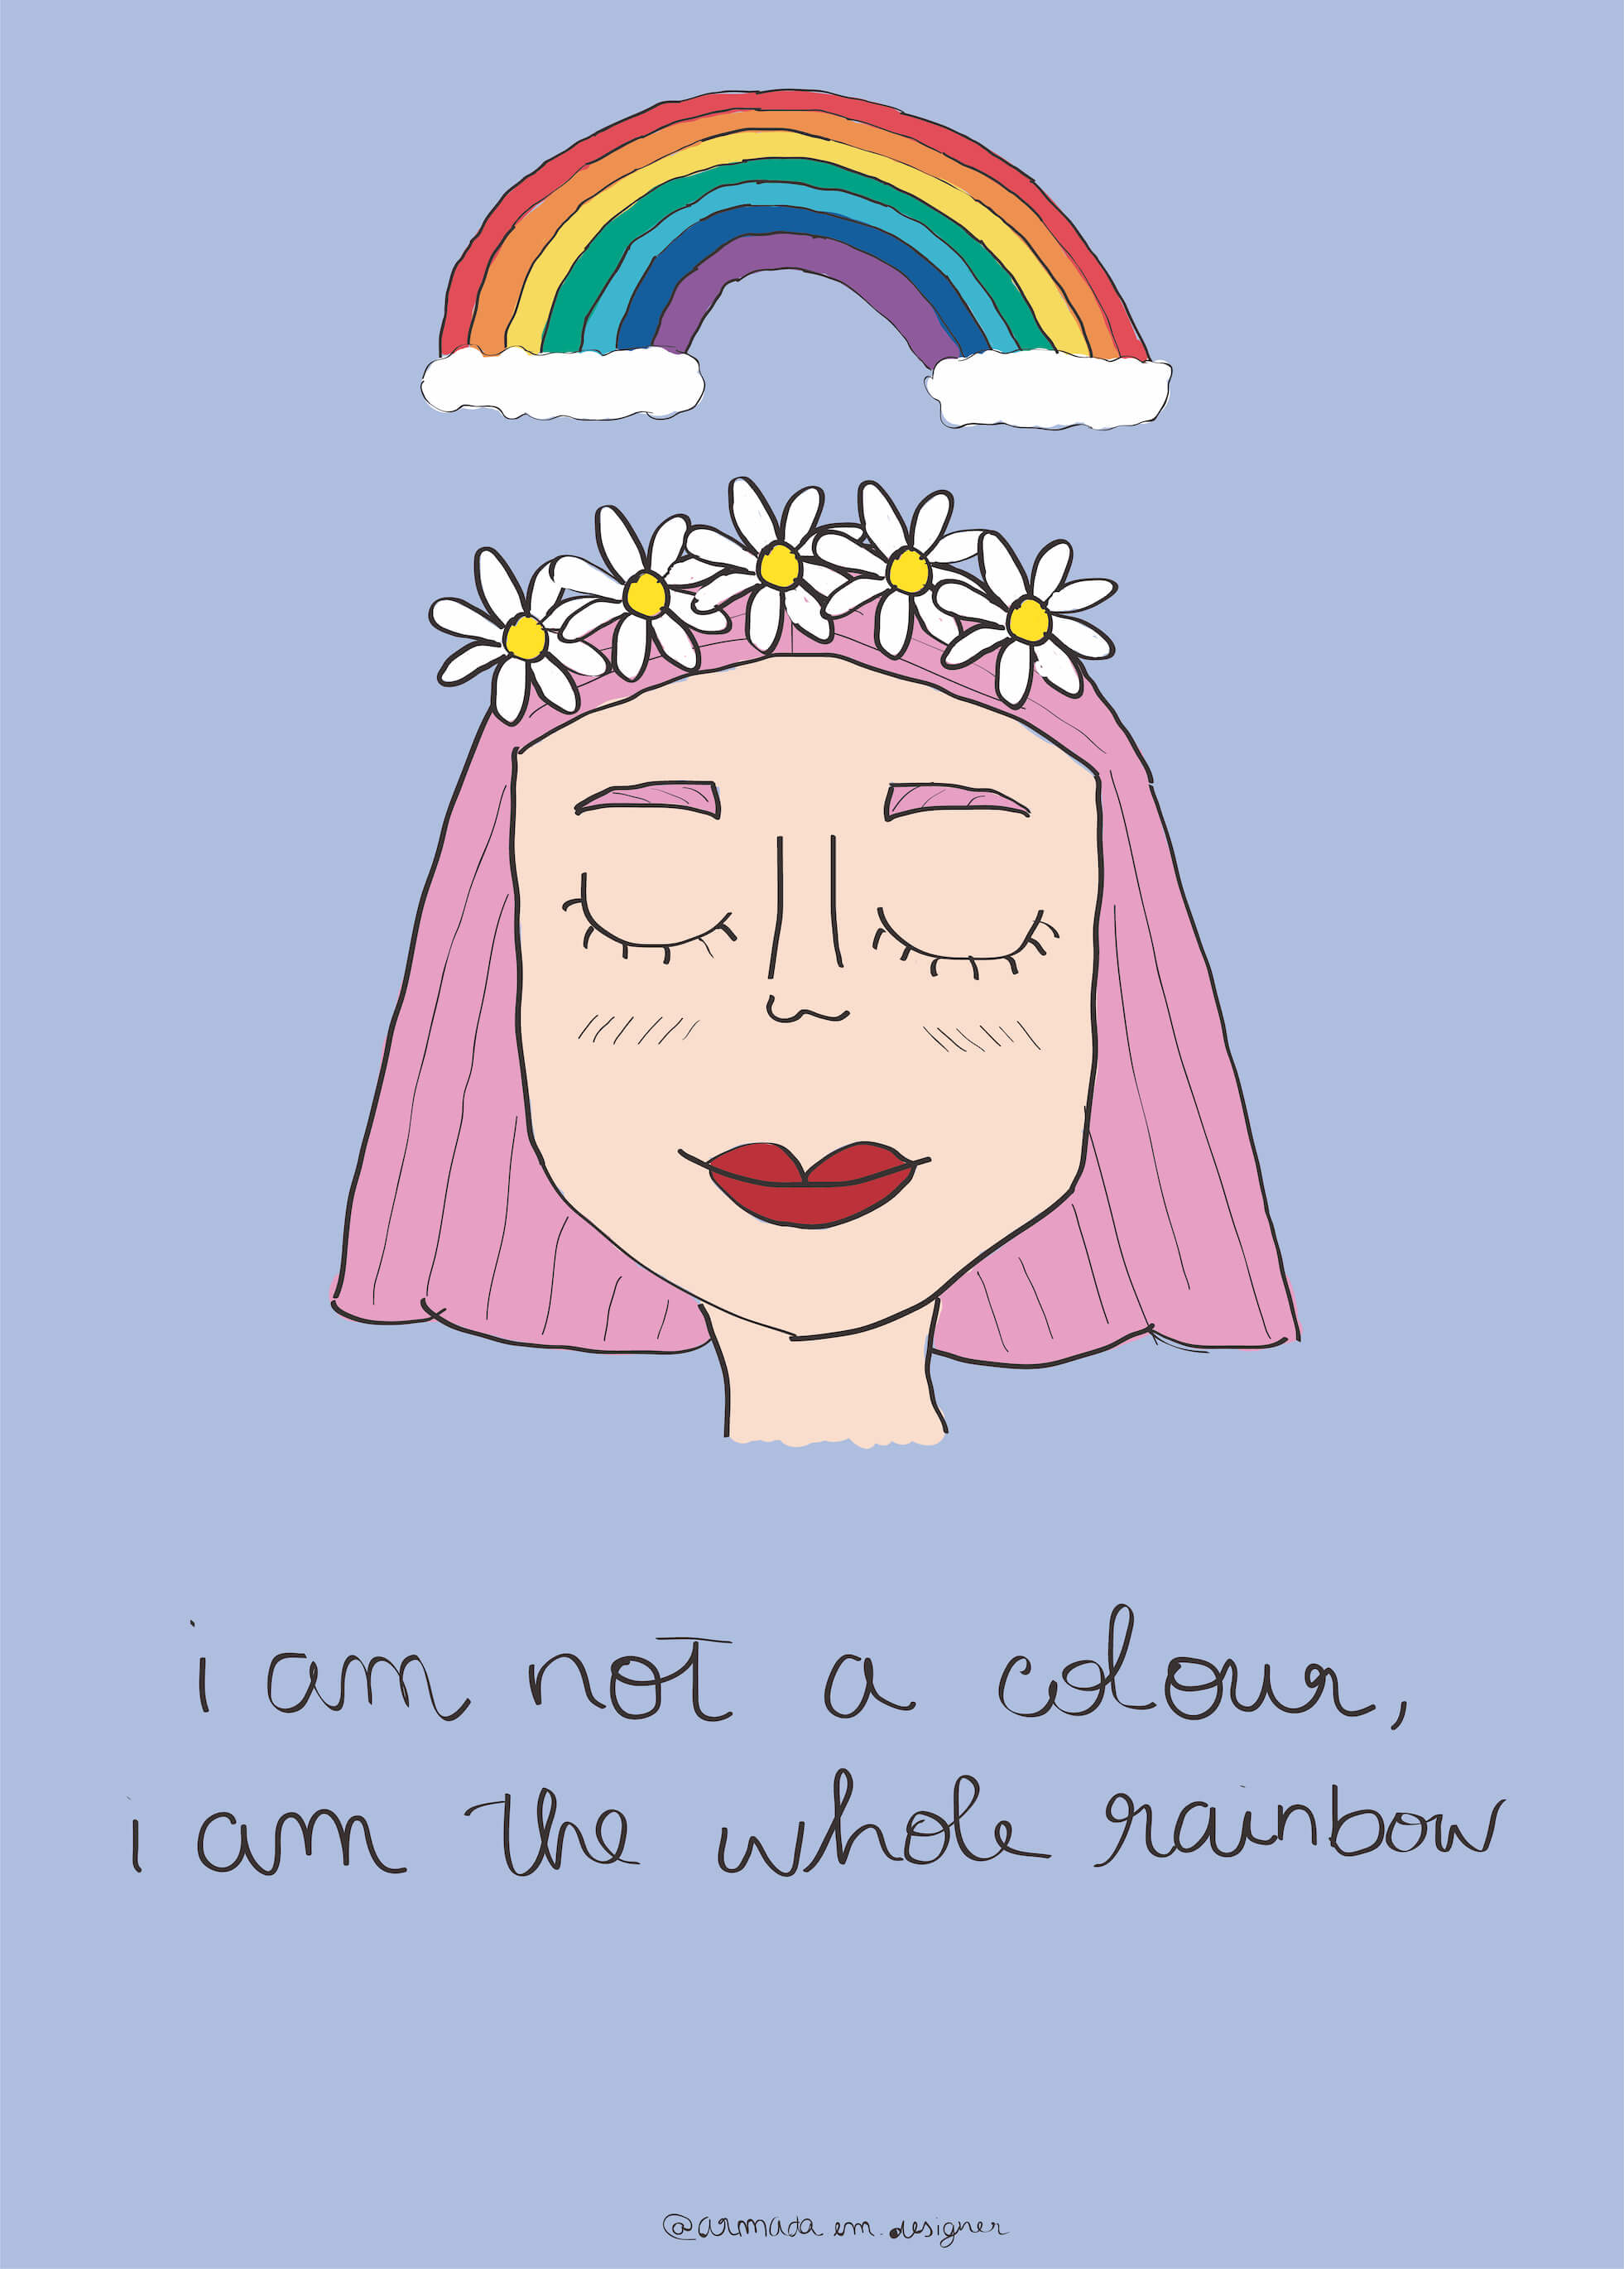 I Am The Whole Rainbow main image